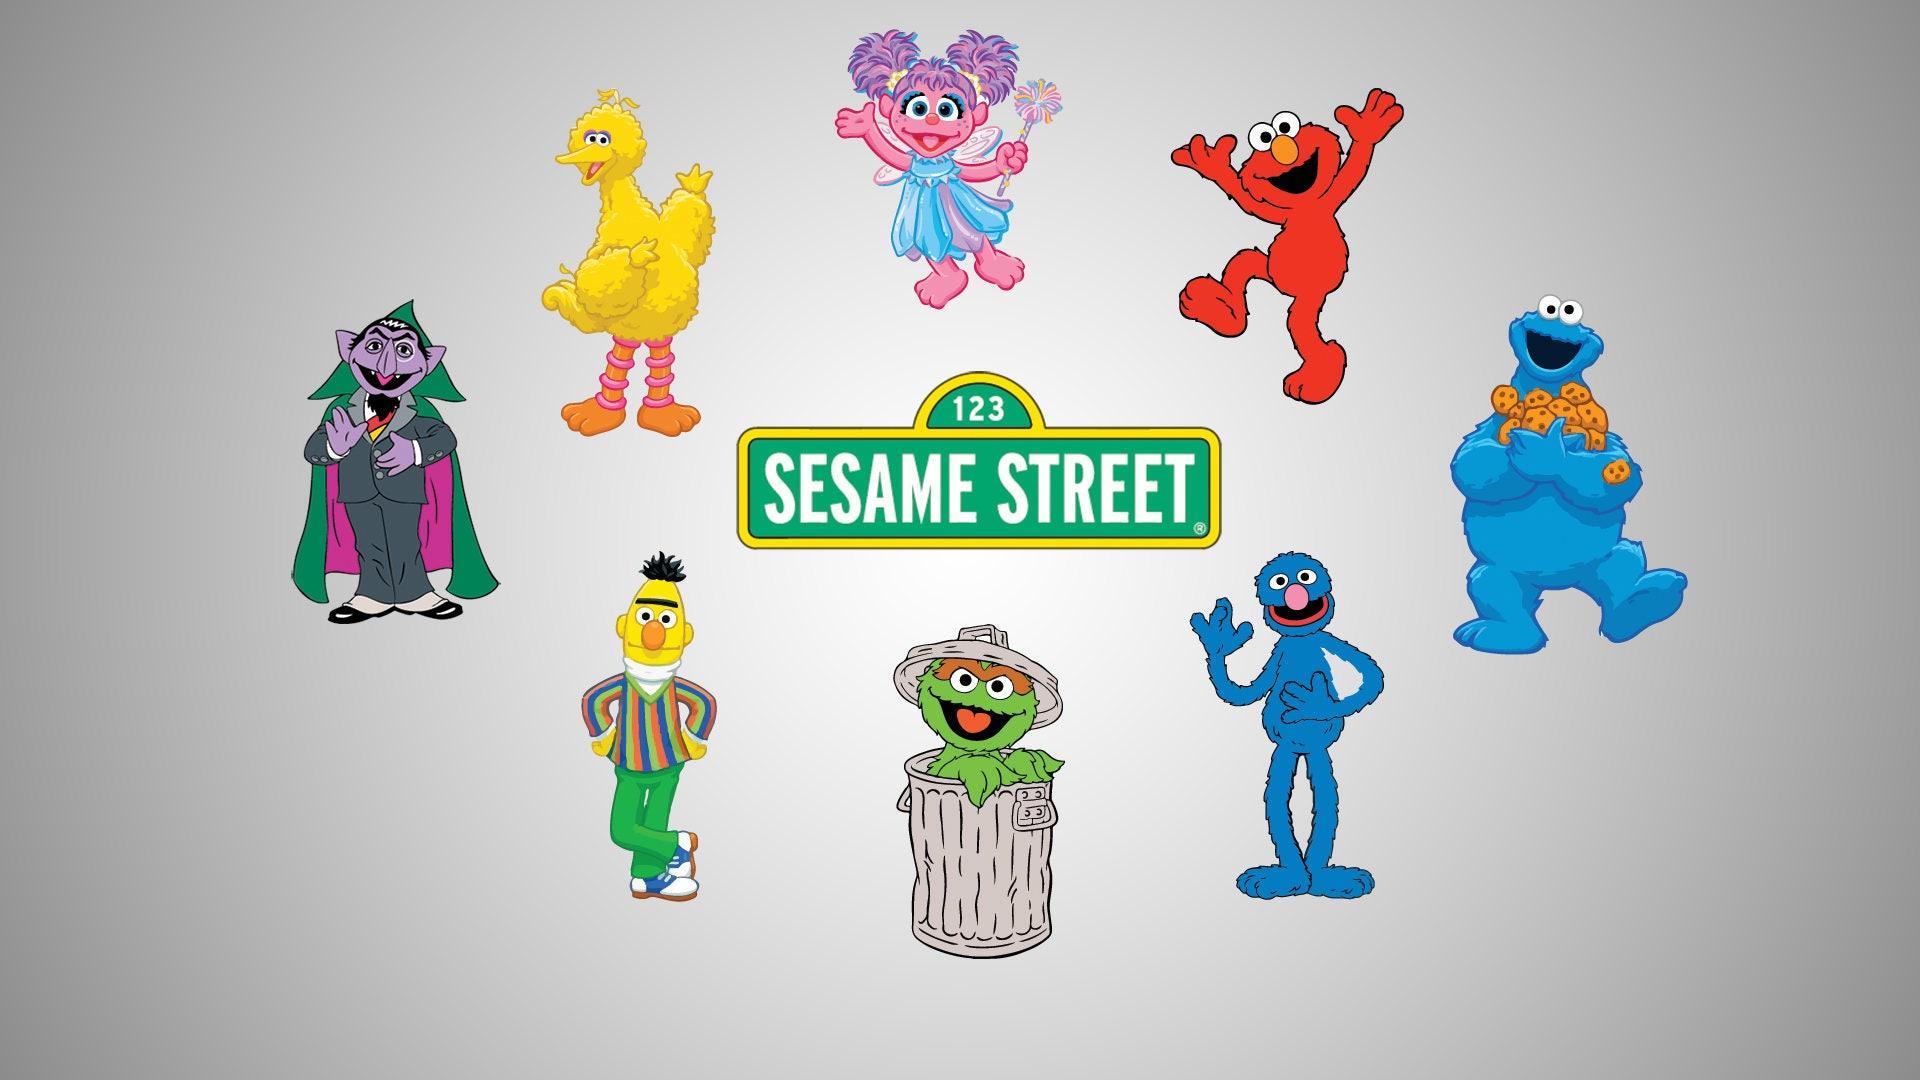 Sesame Street Characters Decals Vinyl Decals SVG file